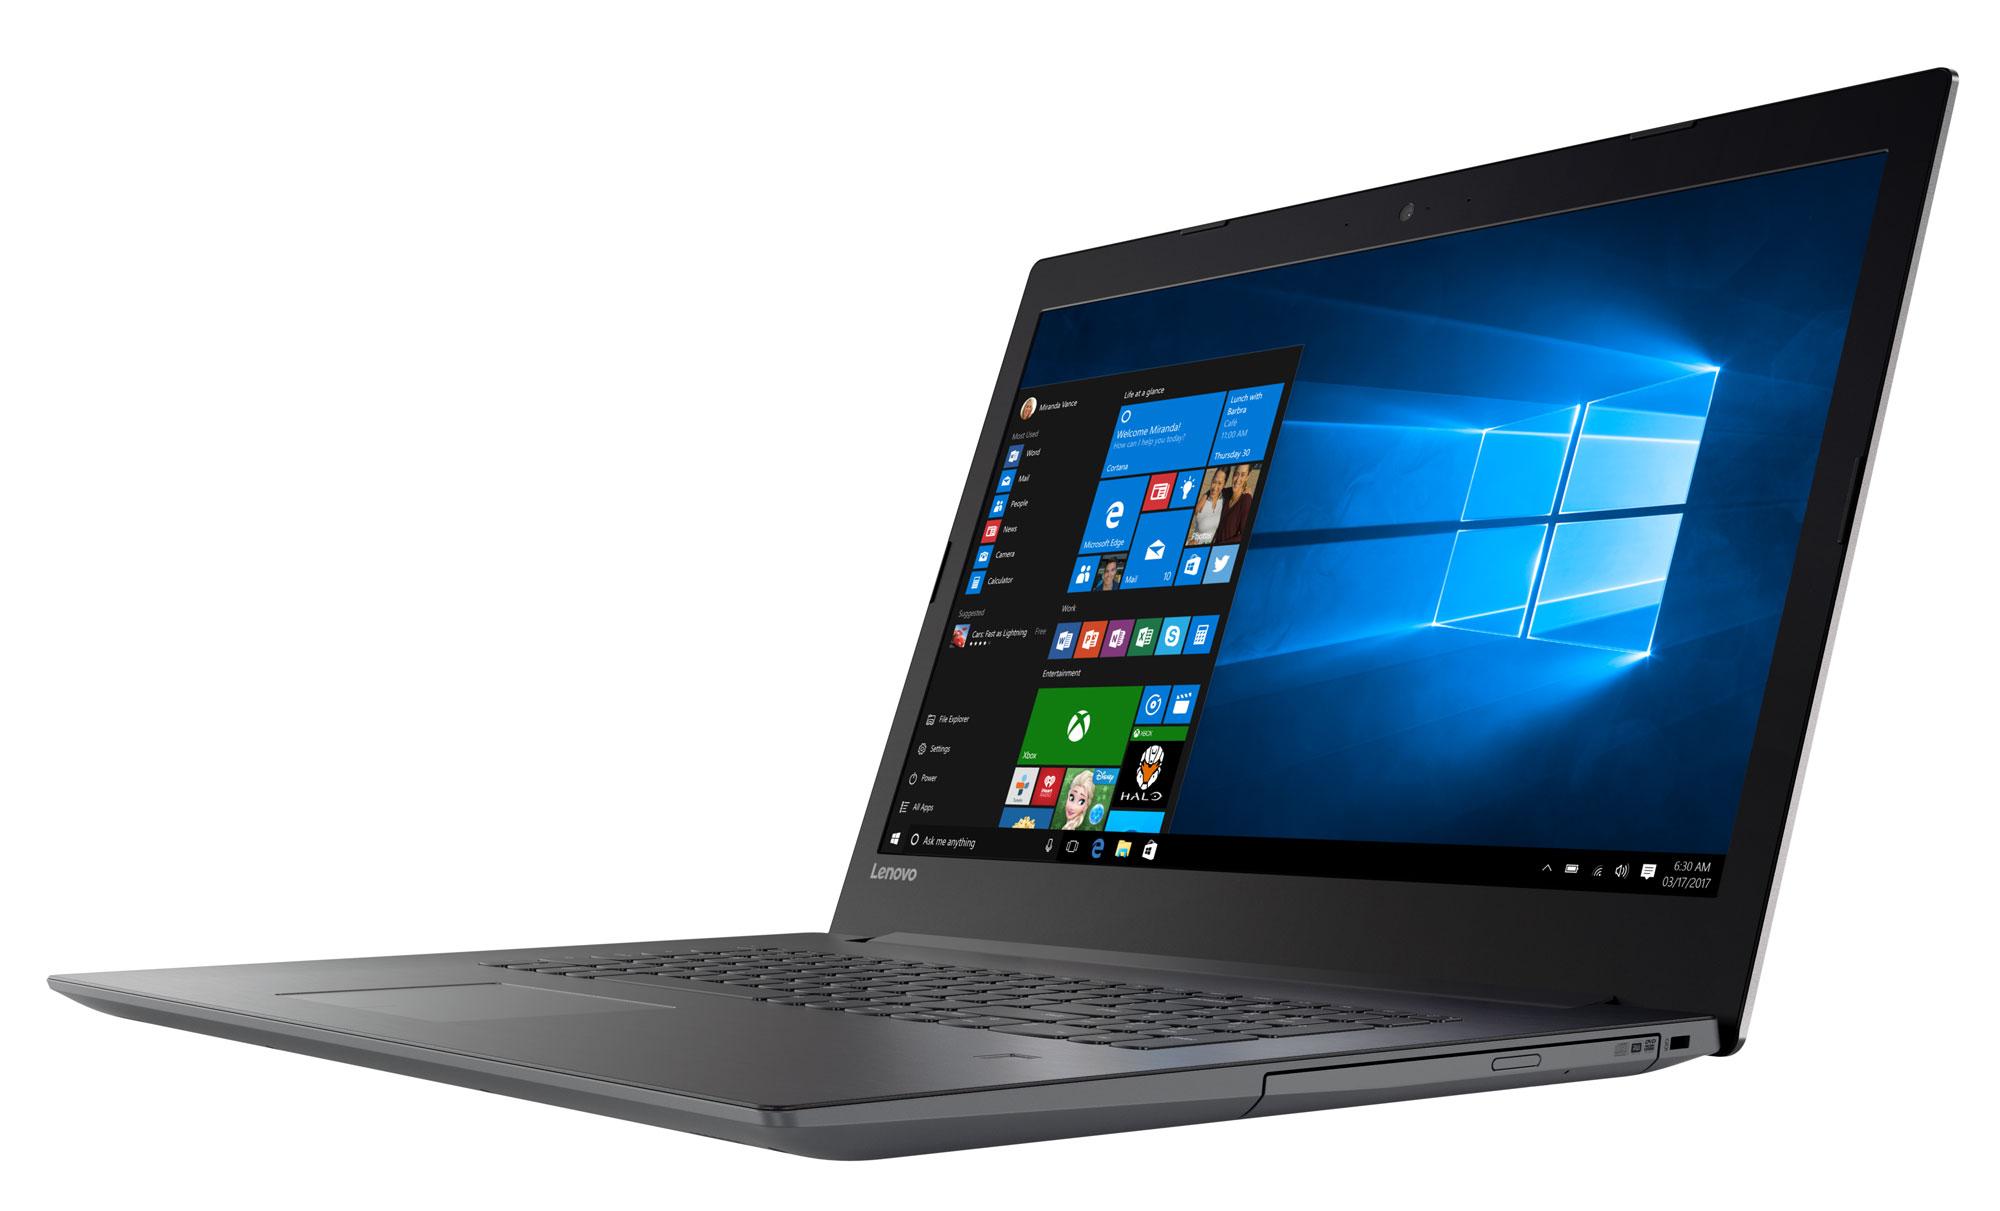 Фото  Ноутбук Lenovo V320-17IKB Iron Grey (81CN0002RA)